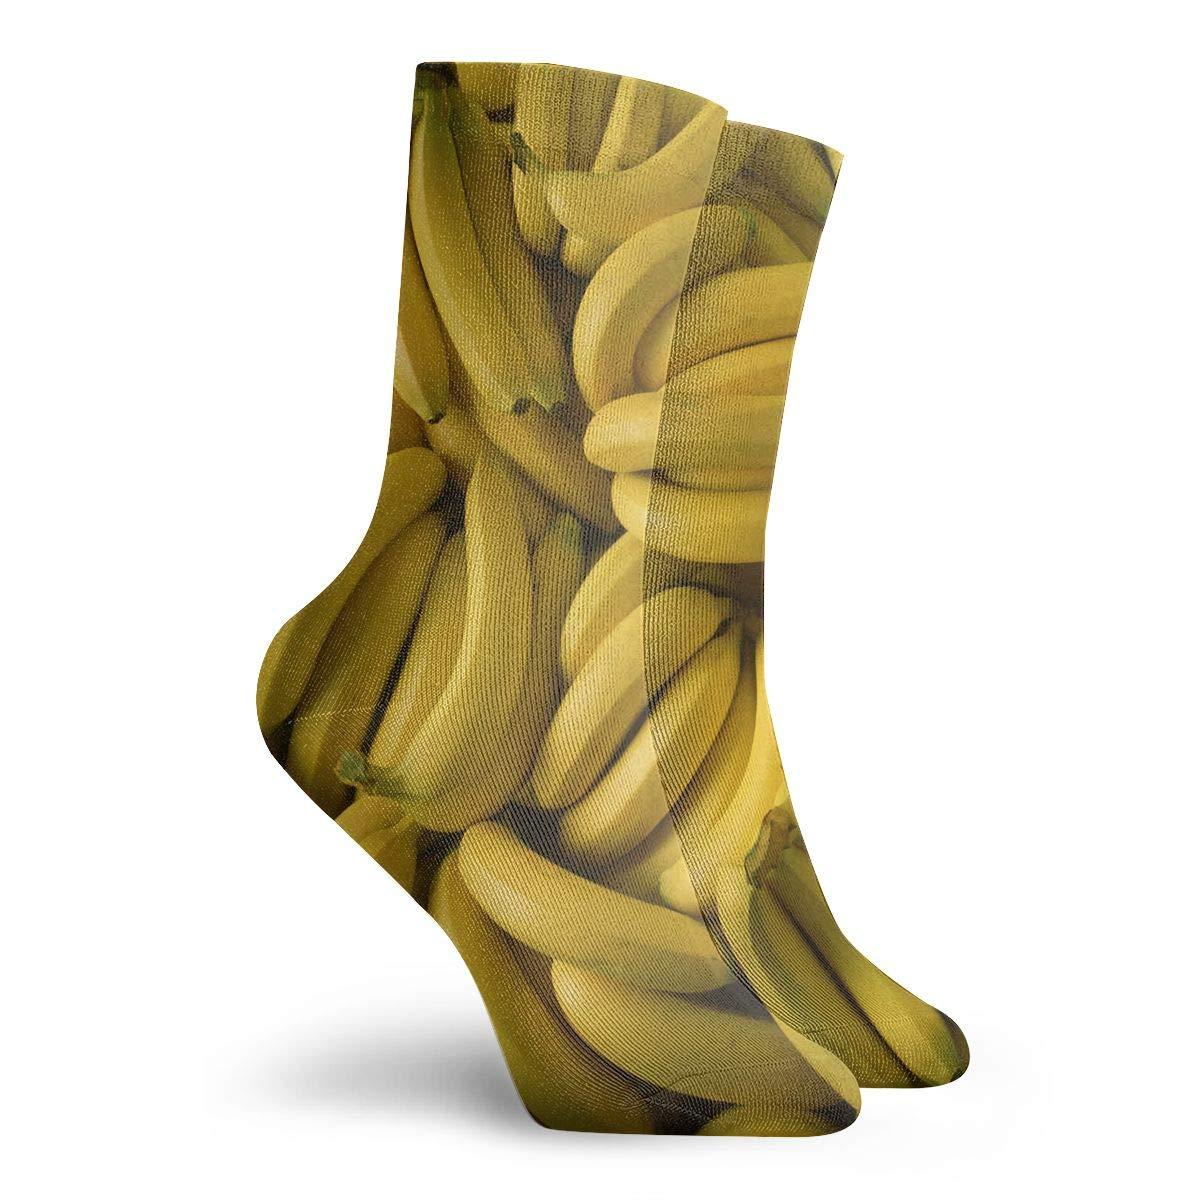 Banana Unisex Funny Casual Crew Socks Athletic Socks For Boys Girls Kids Teenagers